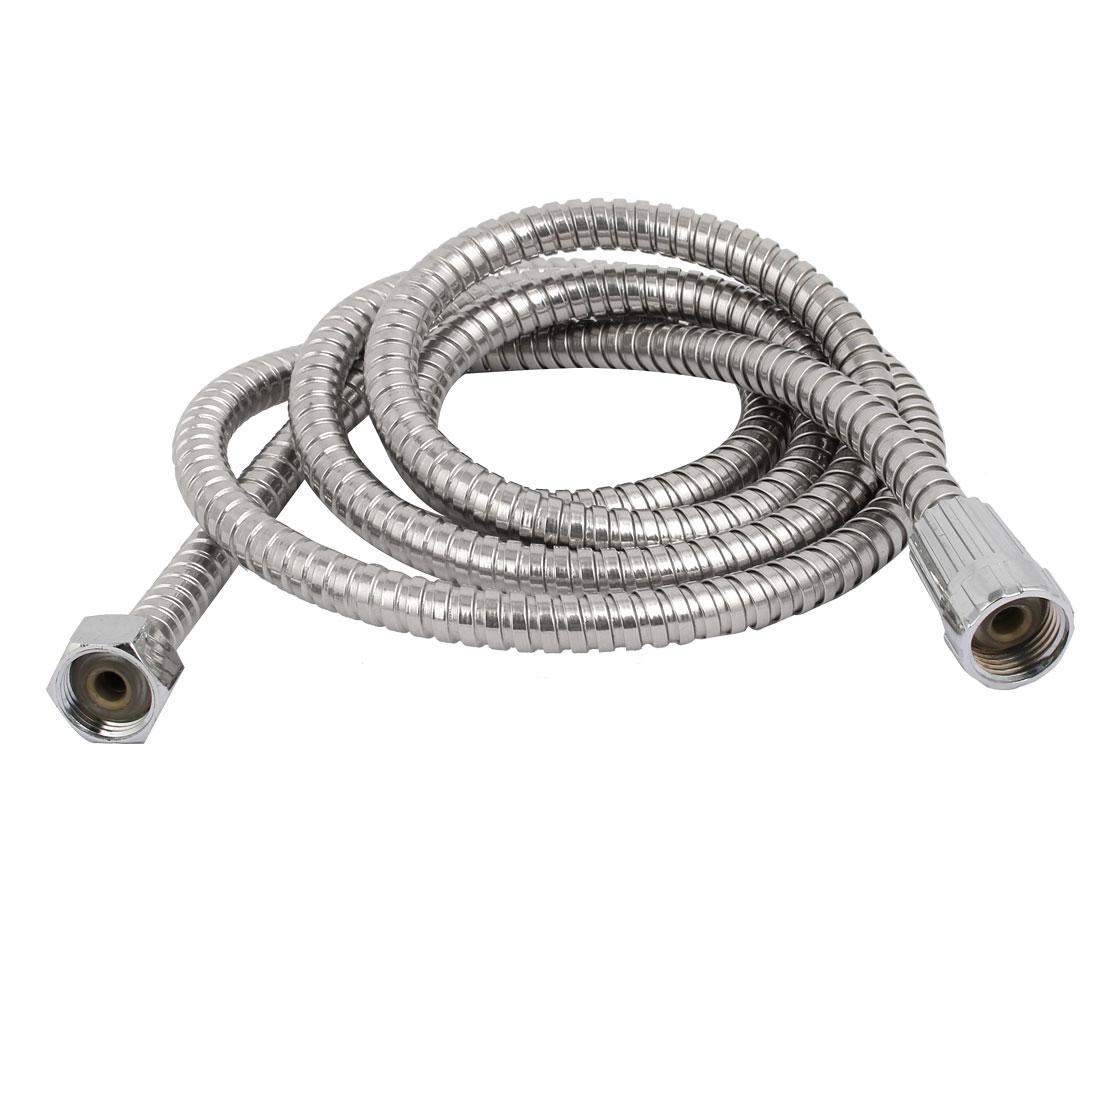 "20mm F1/2"" G1/2"" Thread 200cm Length Stainless Steel Handheld Shower Hose Pipe"